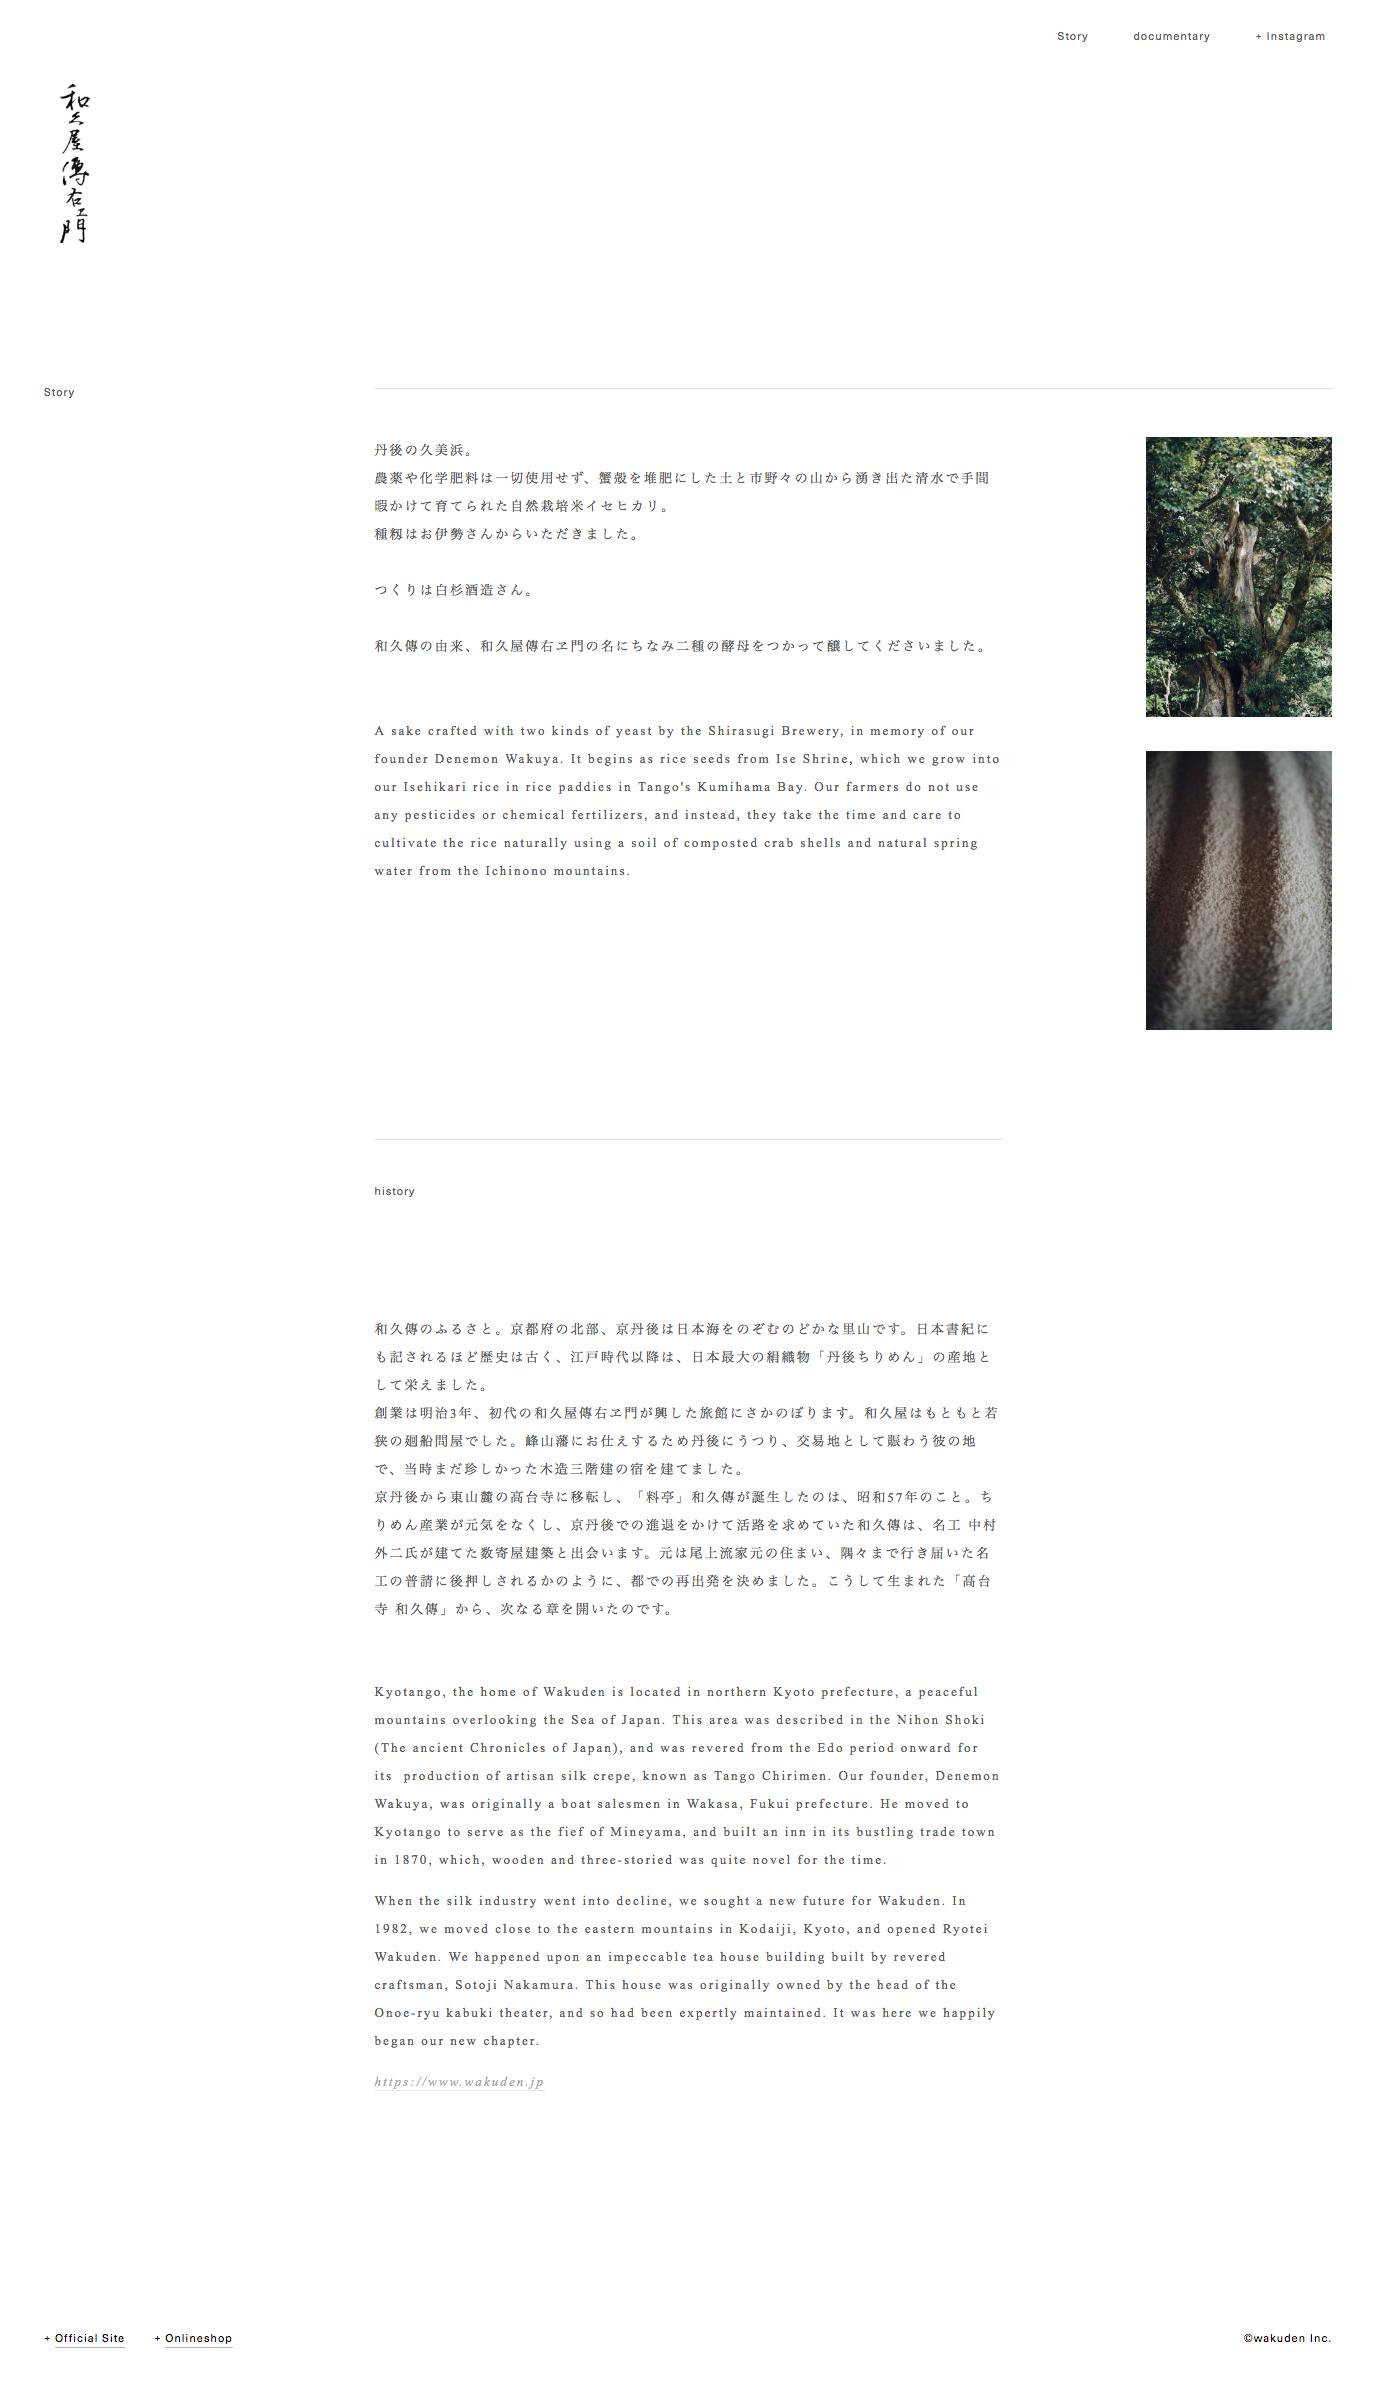 screencapture-wakuyadenemon-jp-story-2019-04-23-20_40_17.png